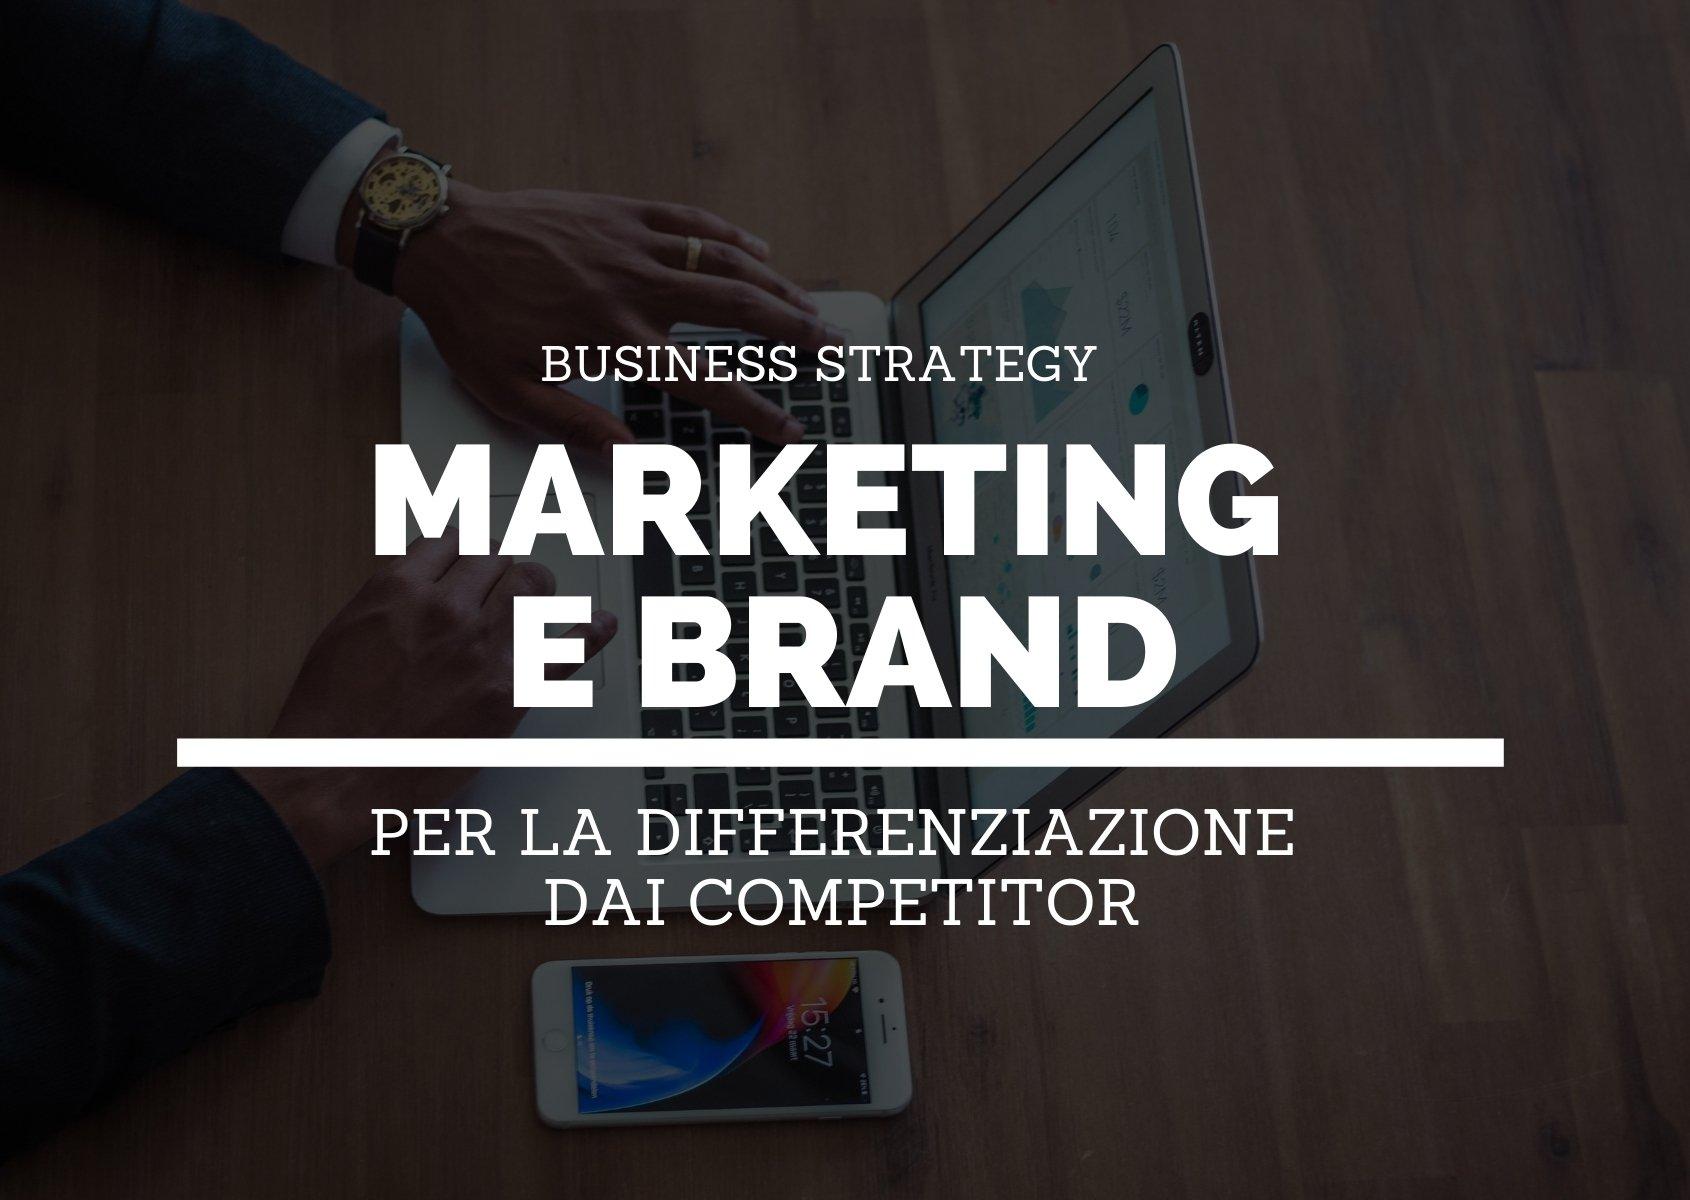 differenziazione-competitor-1